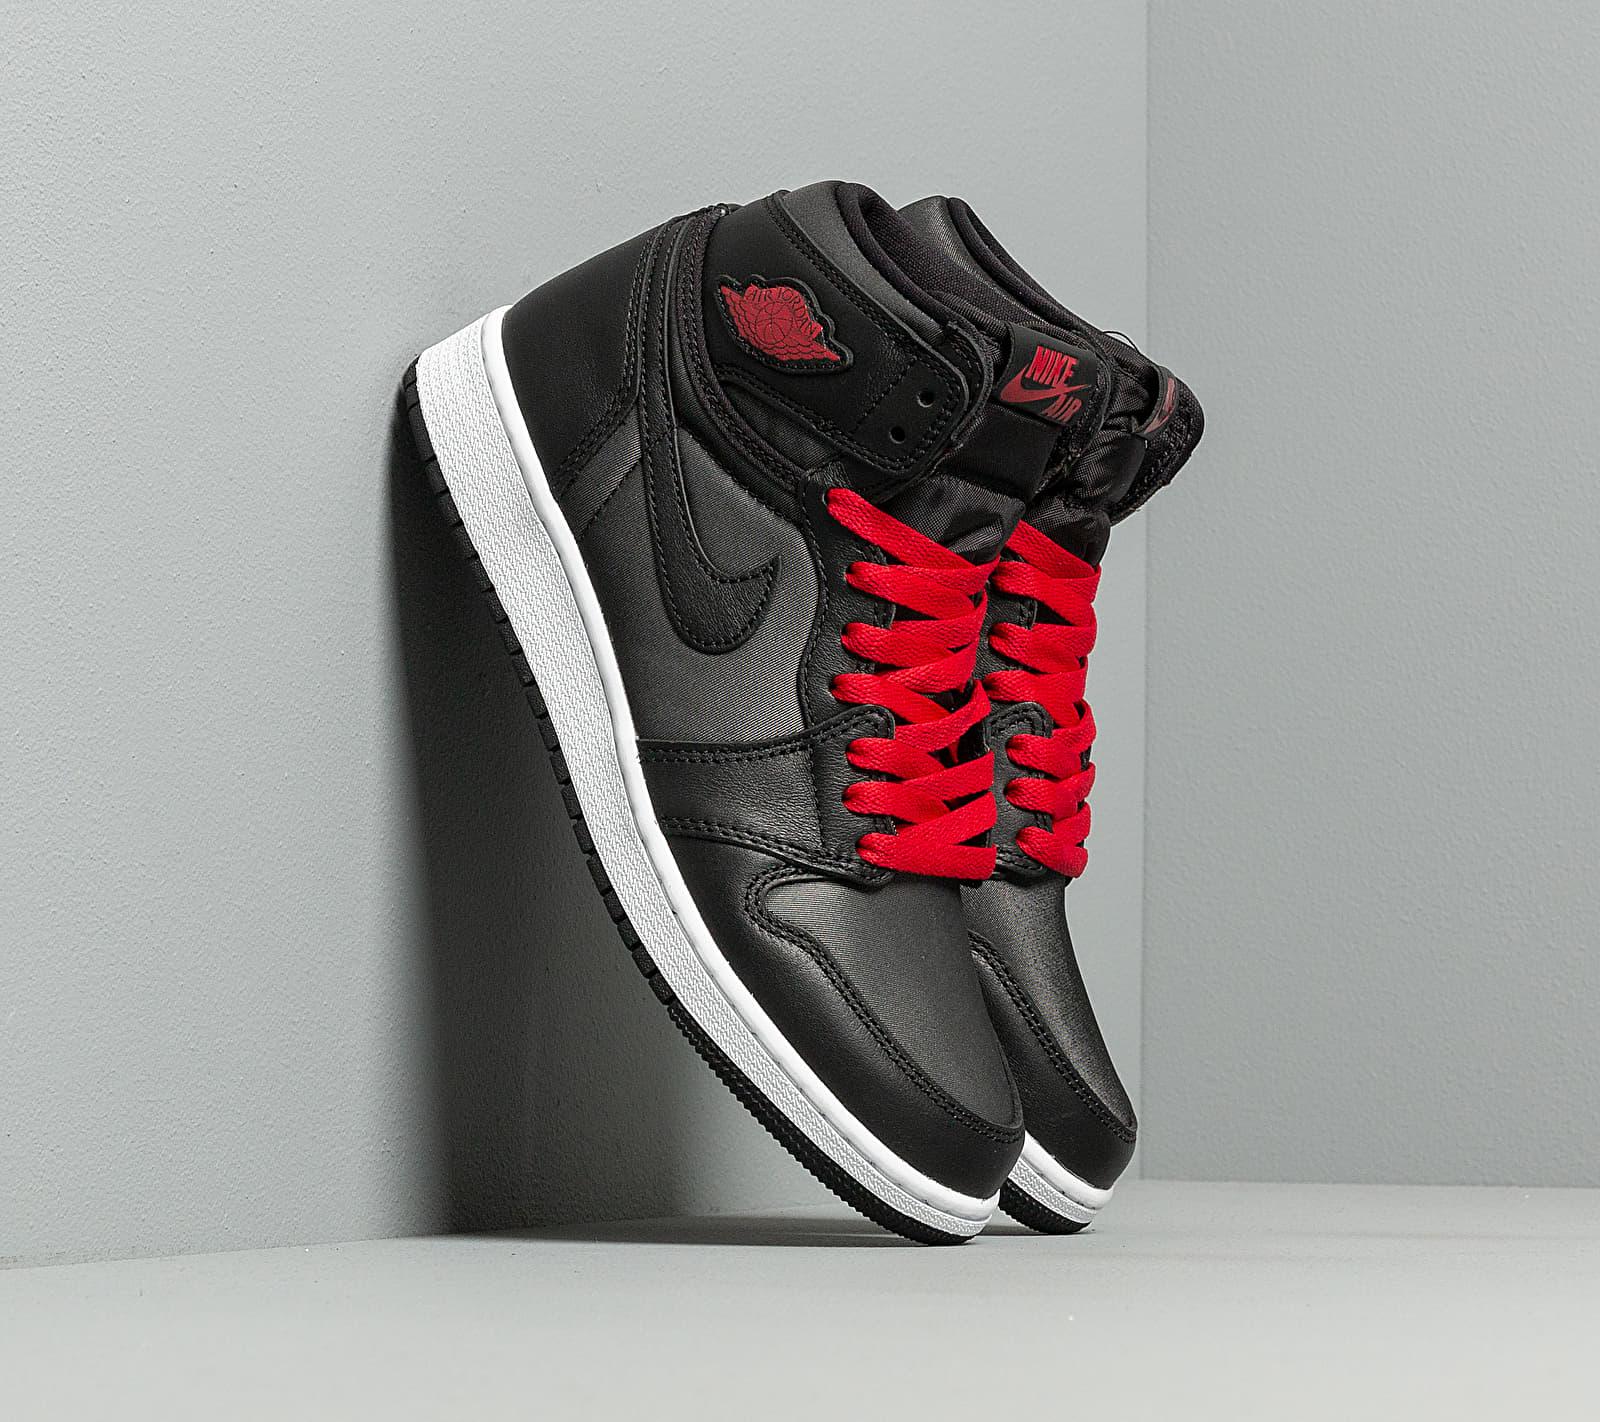 Air Jordan 1 Retro High OG GS Black/ Gym Red-Black-White EUR 36